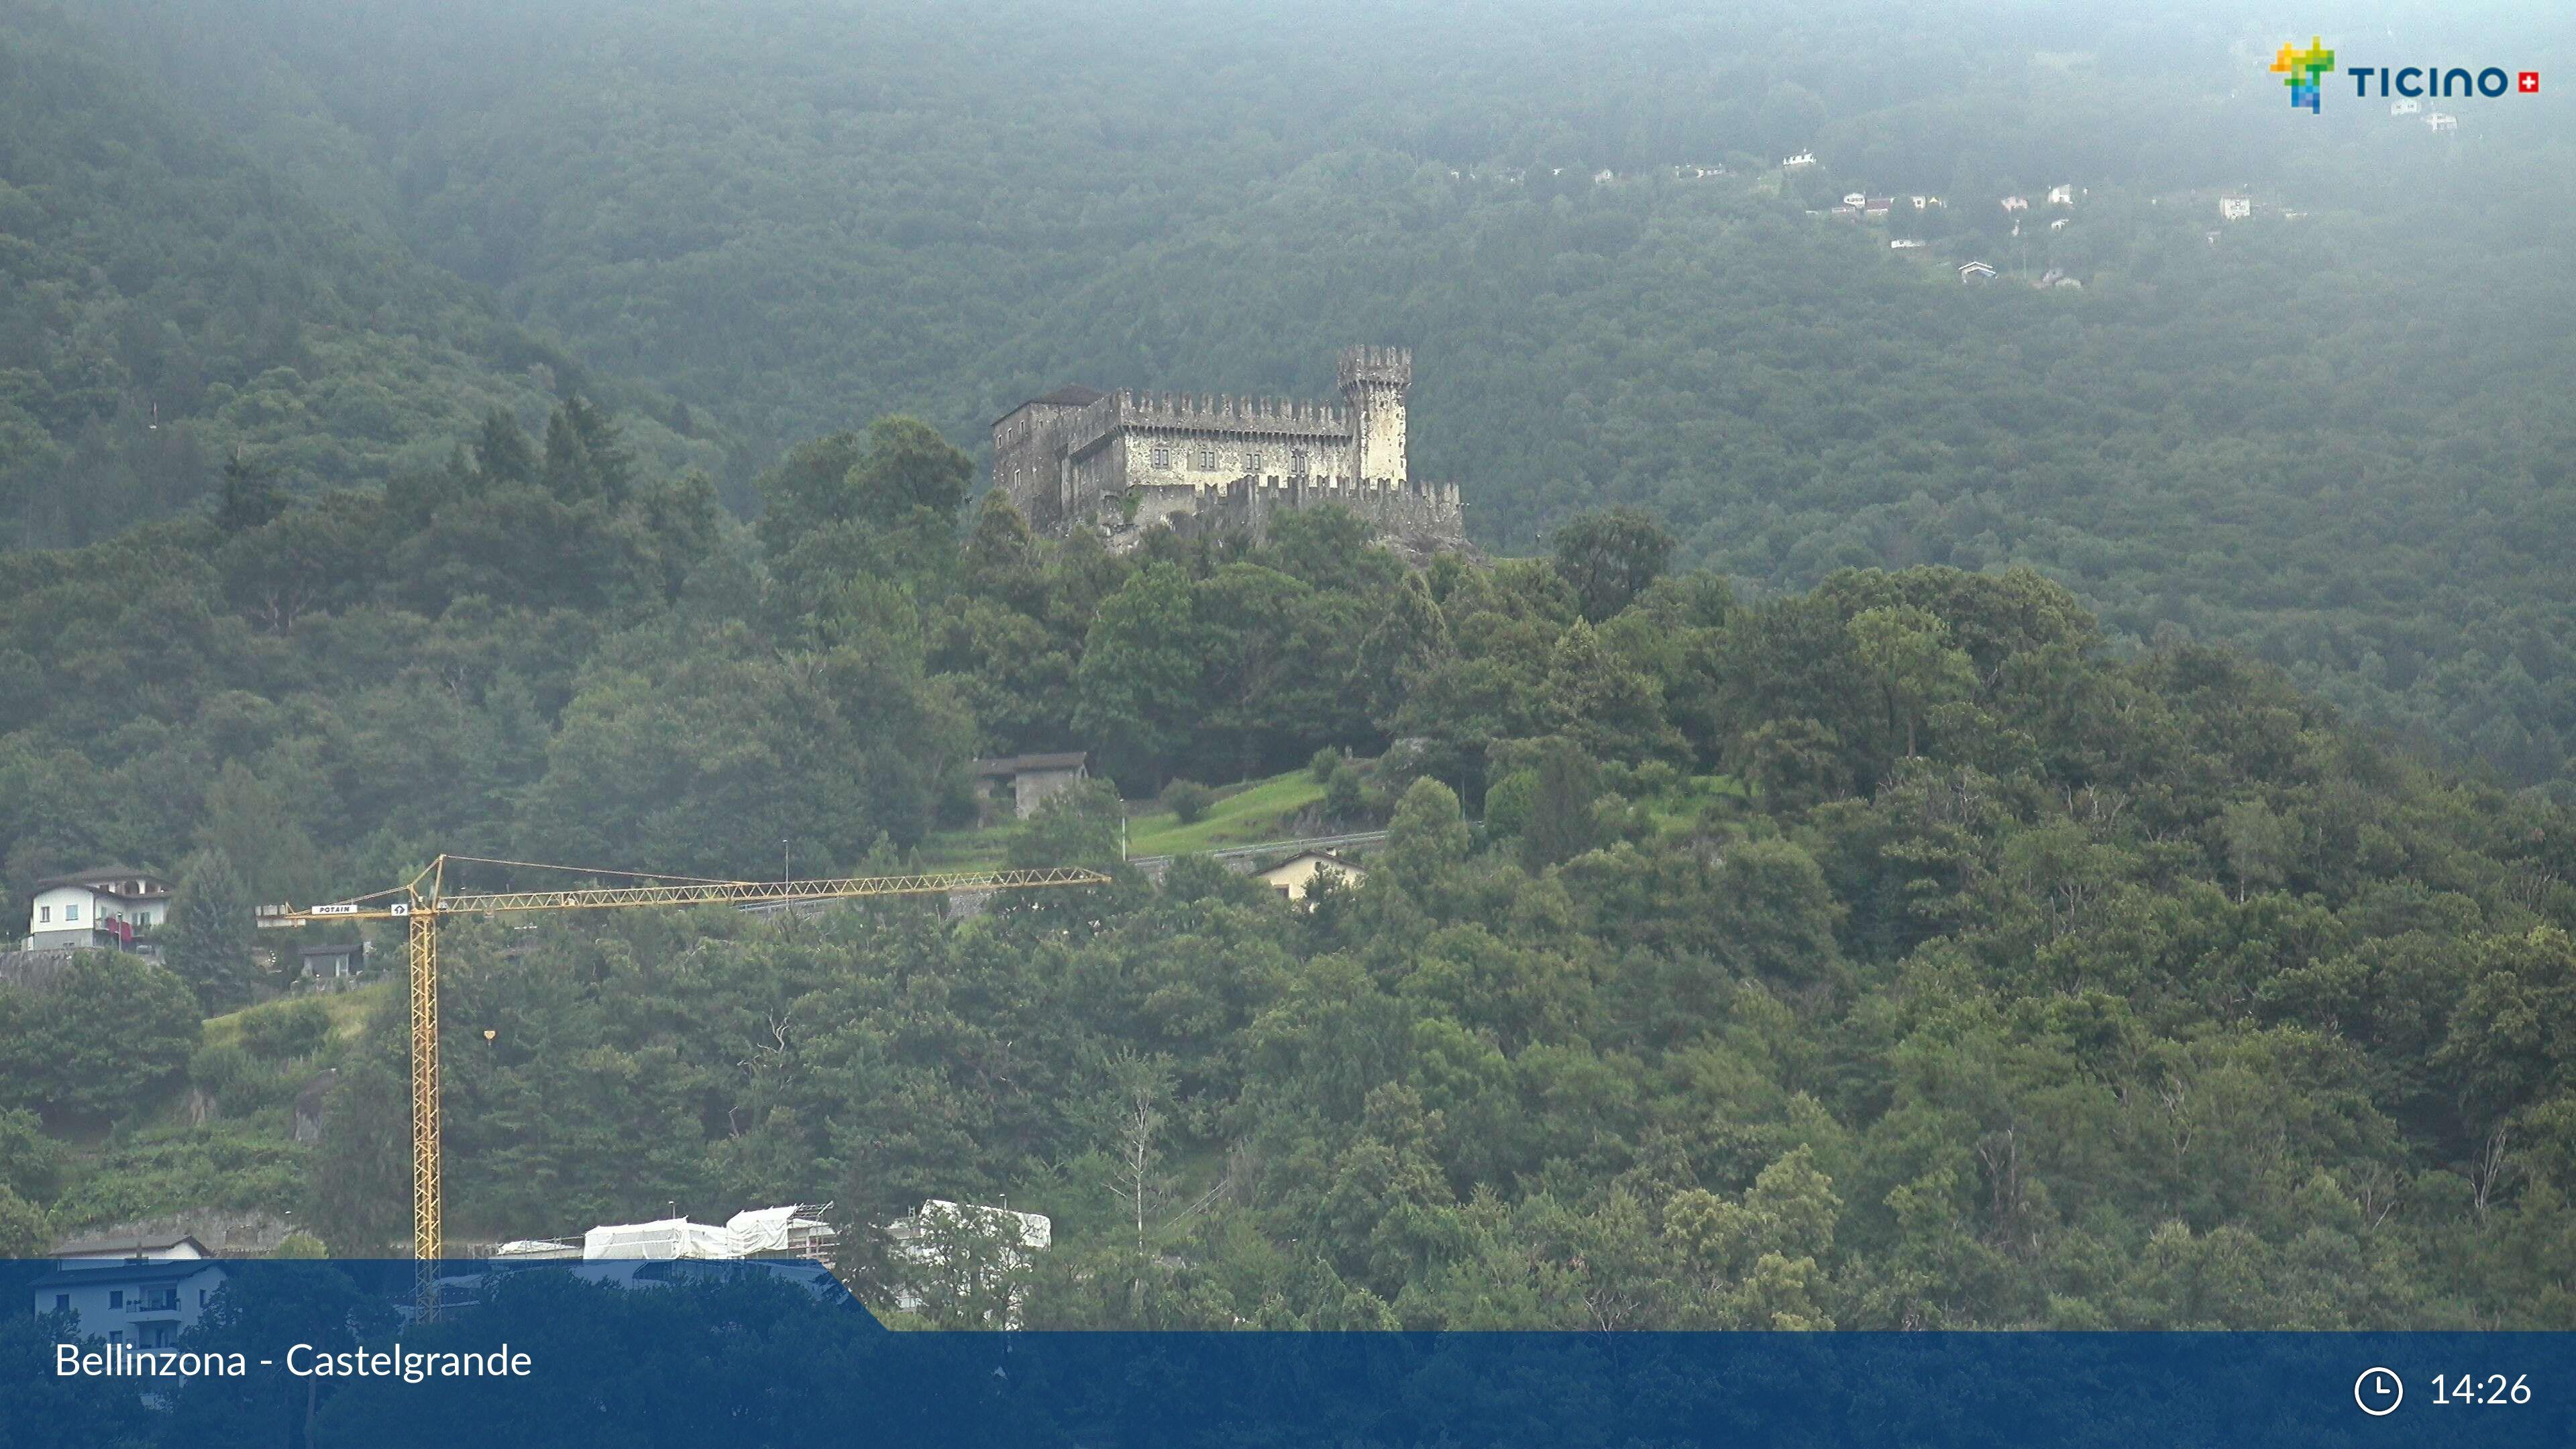 Bellinzona: Castelgrande, Castello Sasso Corbaro